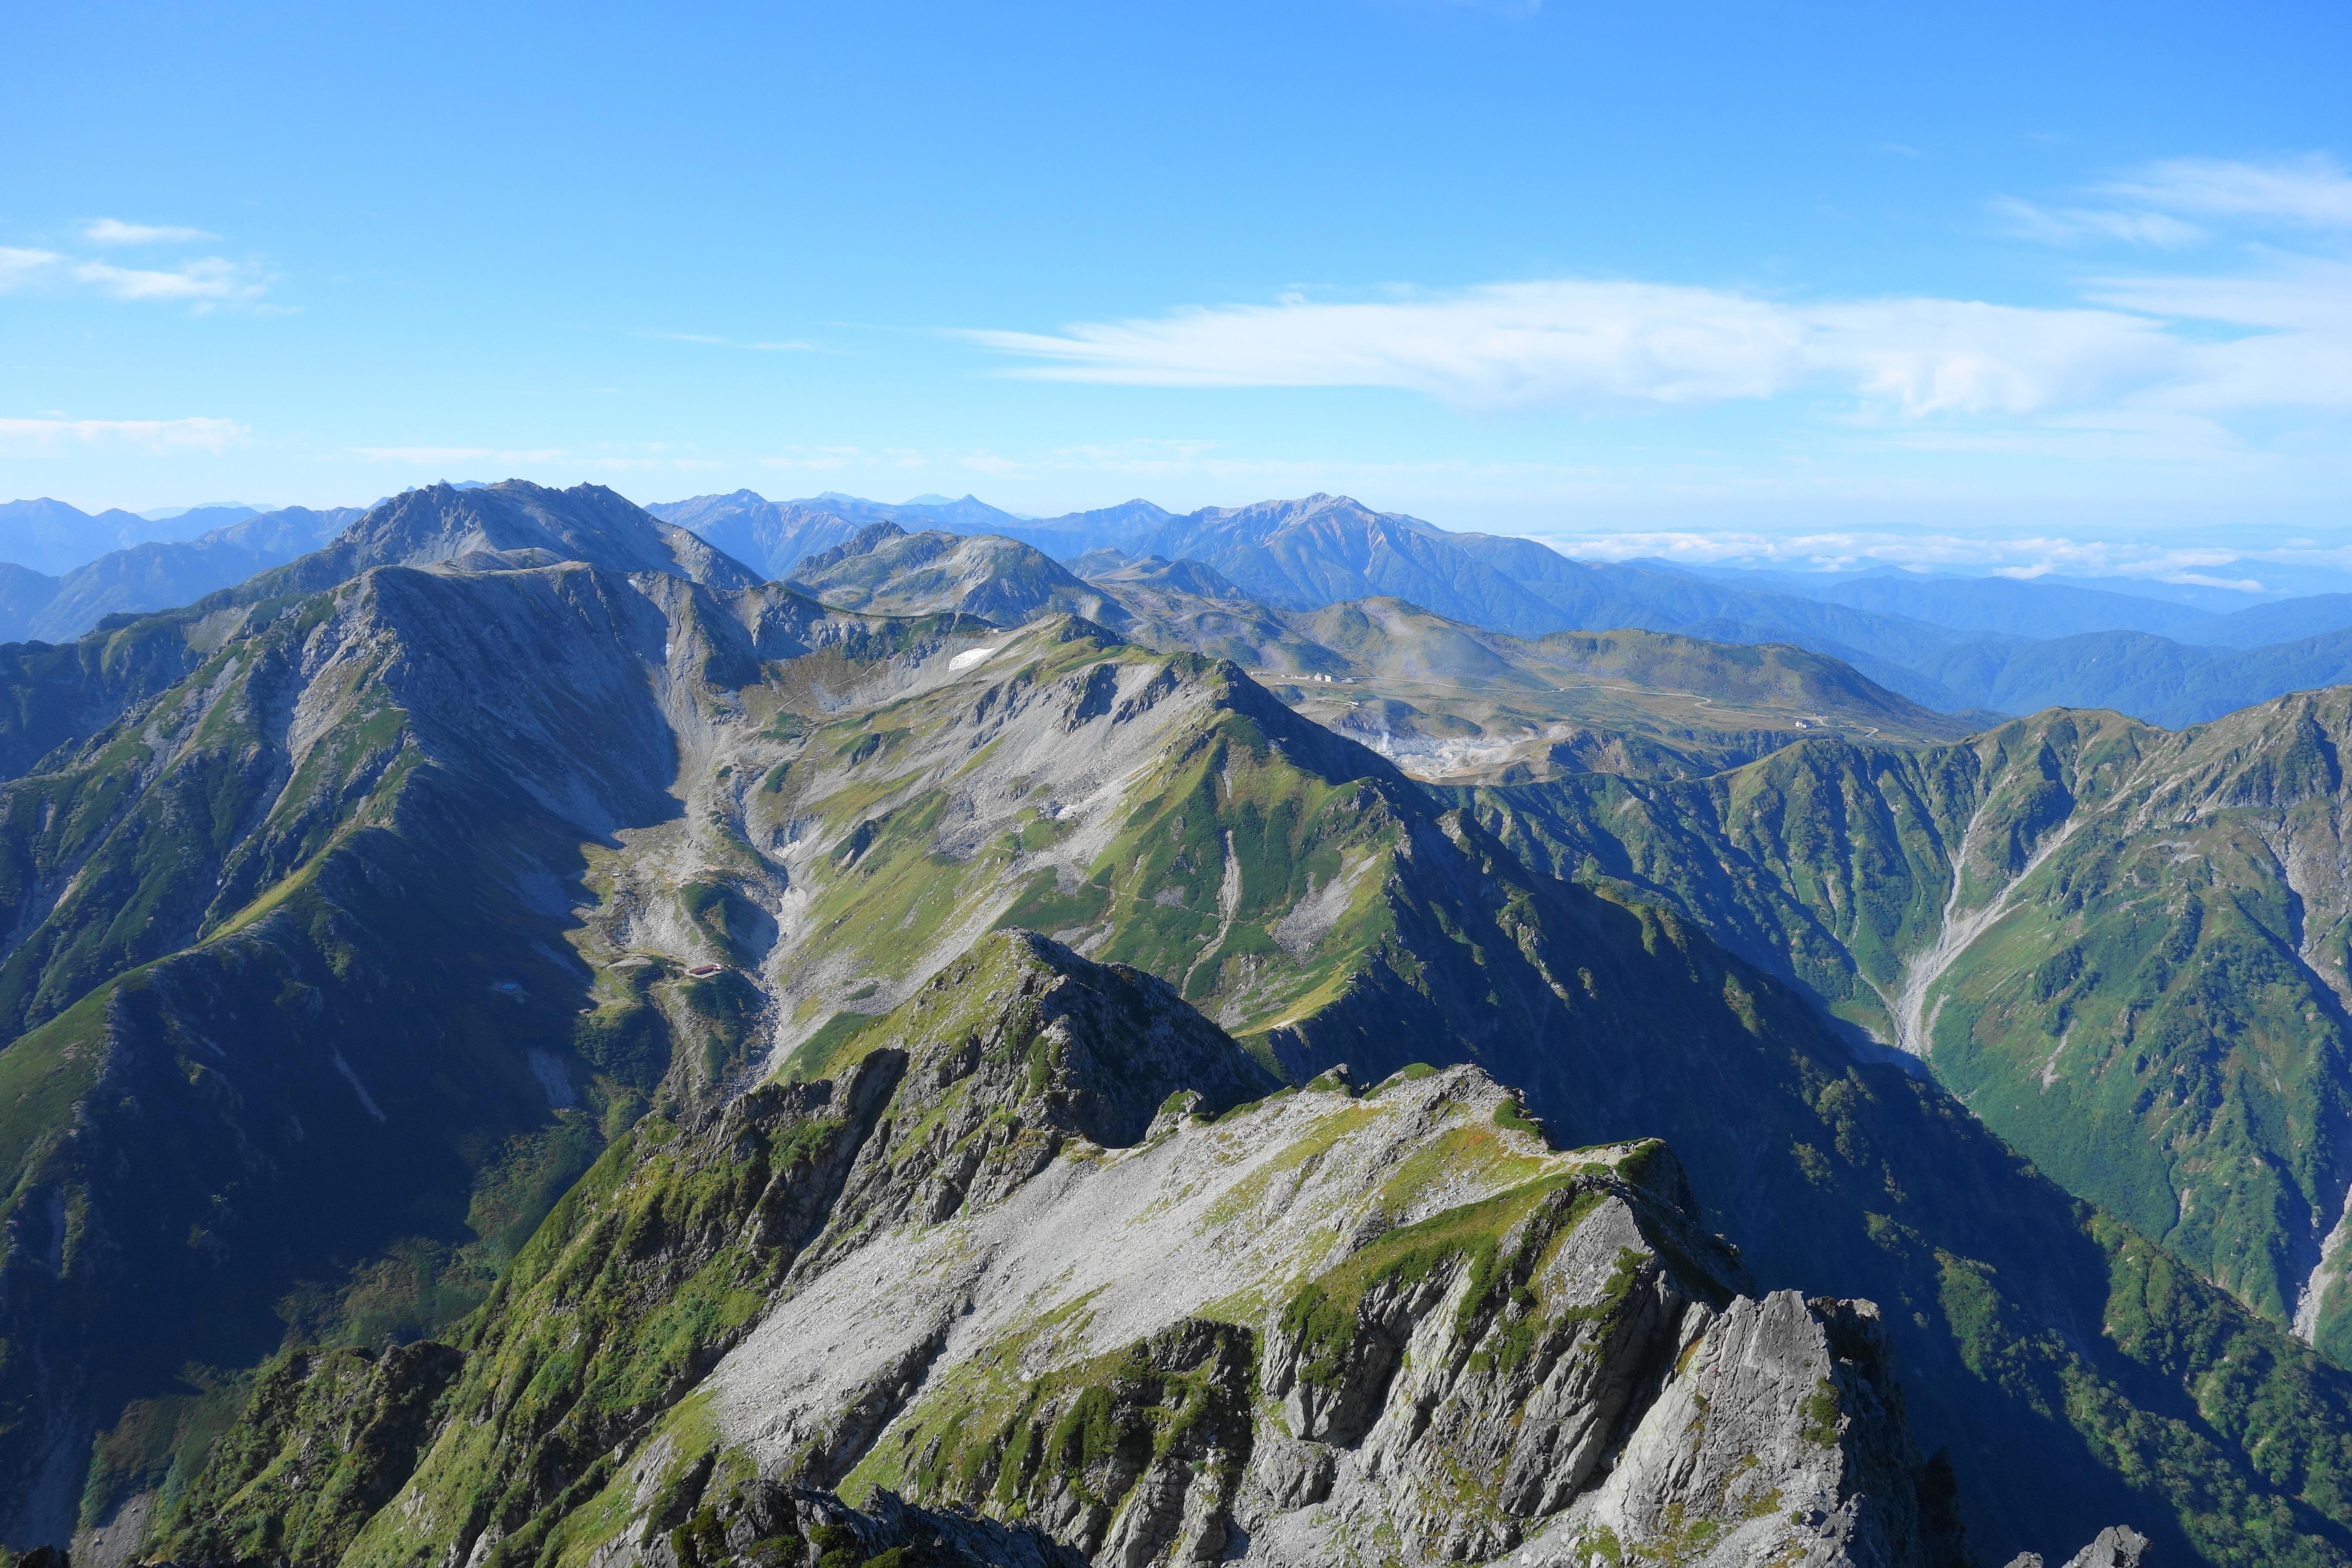 DSC01374剱岳山頂から室堂.JPG